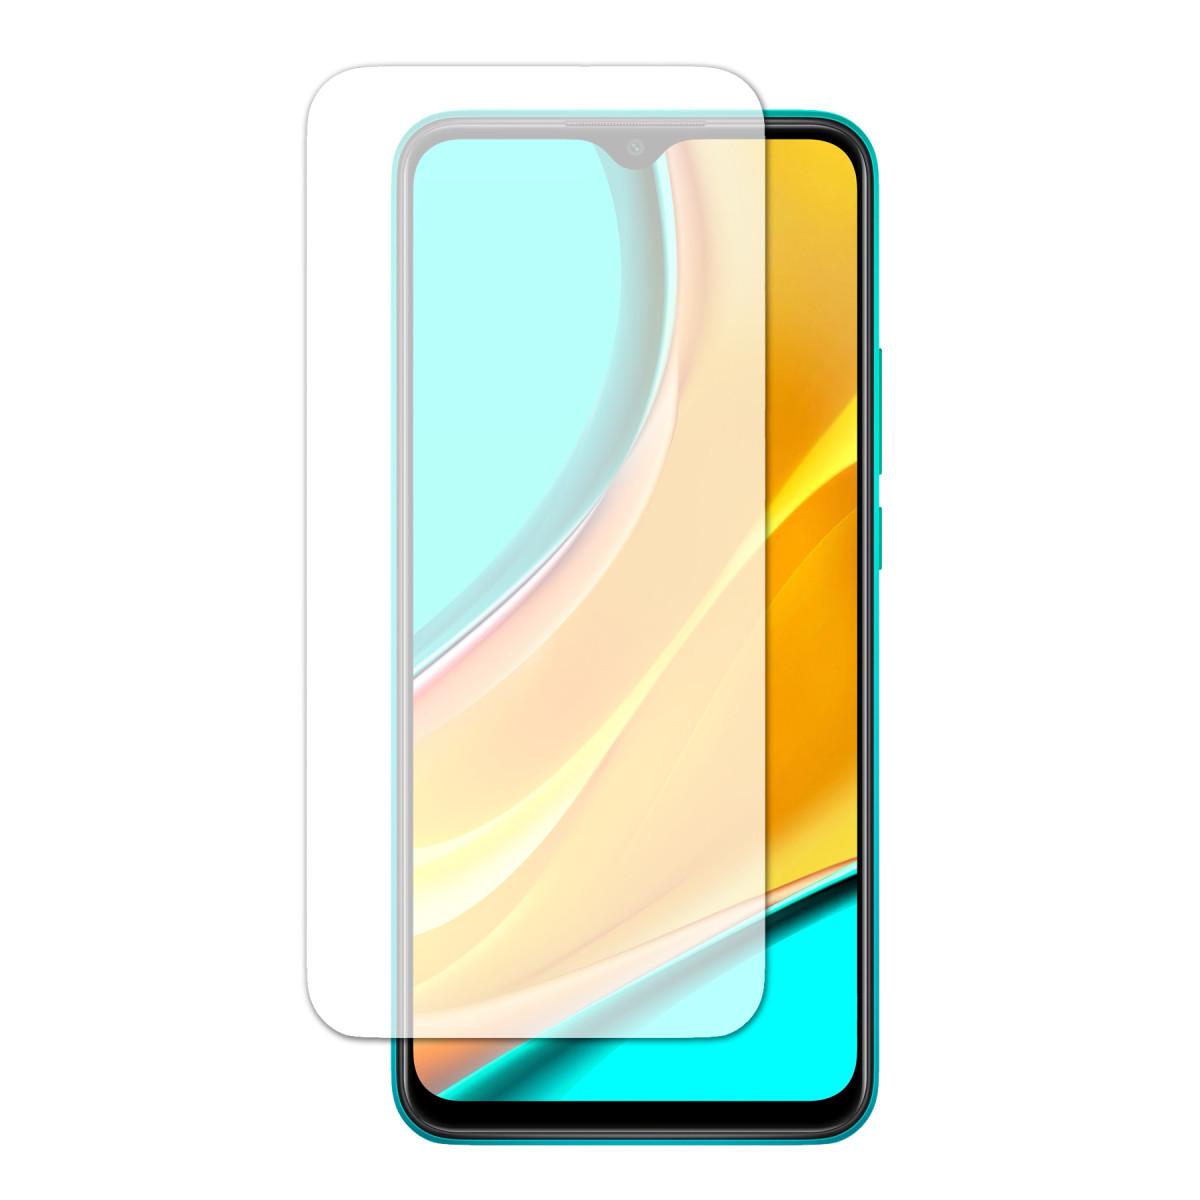 Гідрогелева захисна плівка для смартфонів Redmi (5/5A/Note 6/7/7A/Note 7A/Note 8 Pro/Note 8T/9/9T та інші)